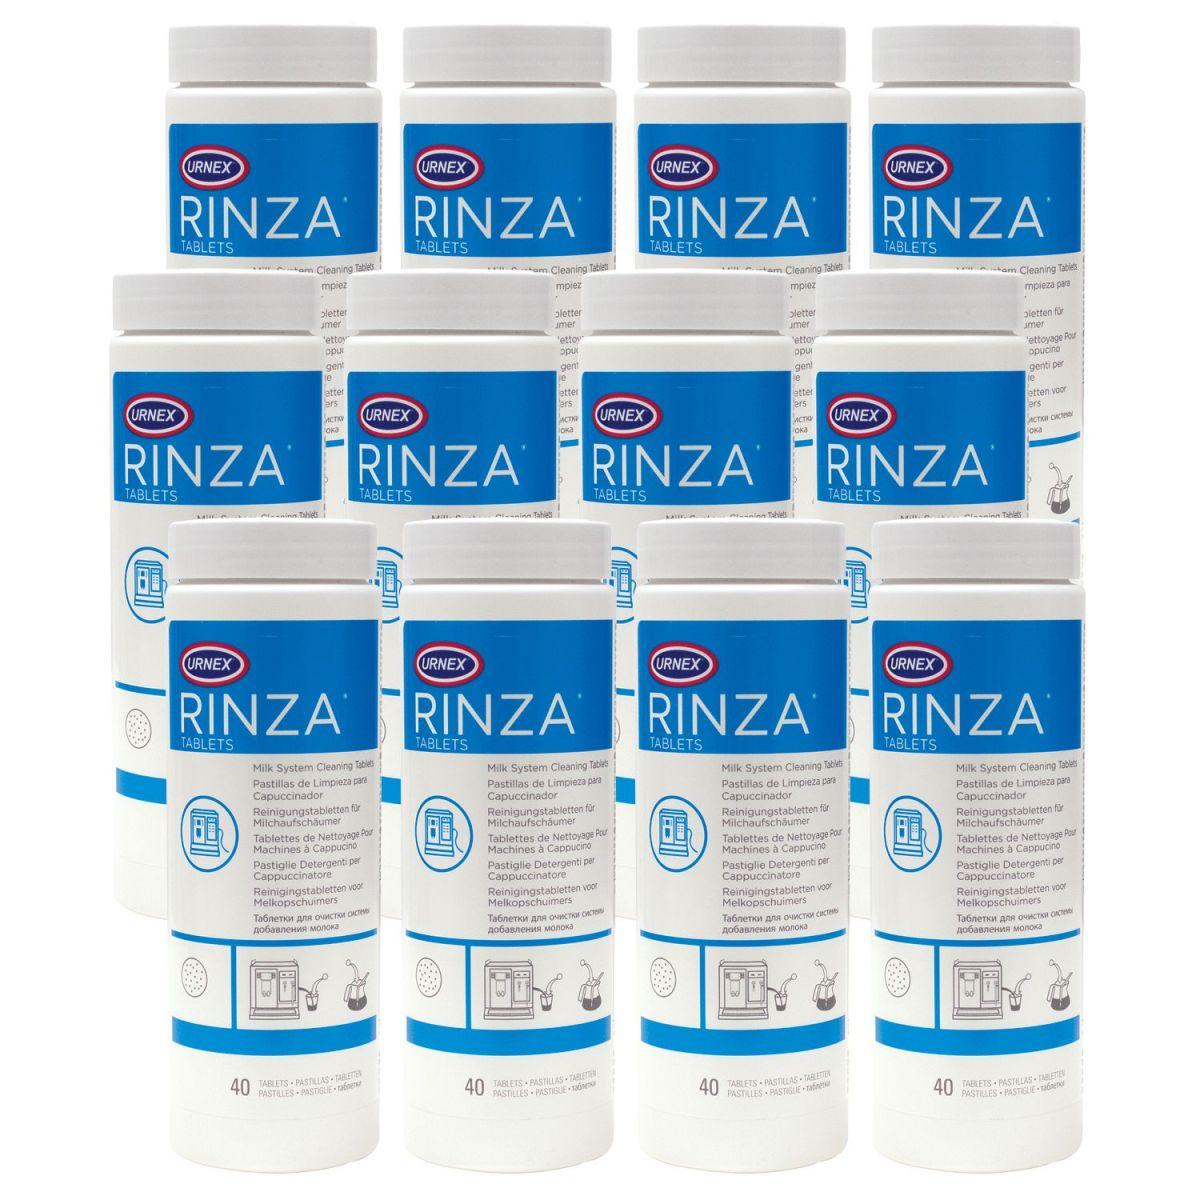 RINZA, ACID 40 TABLETS (12/CS